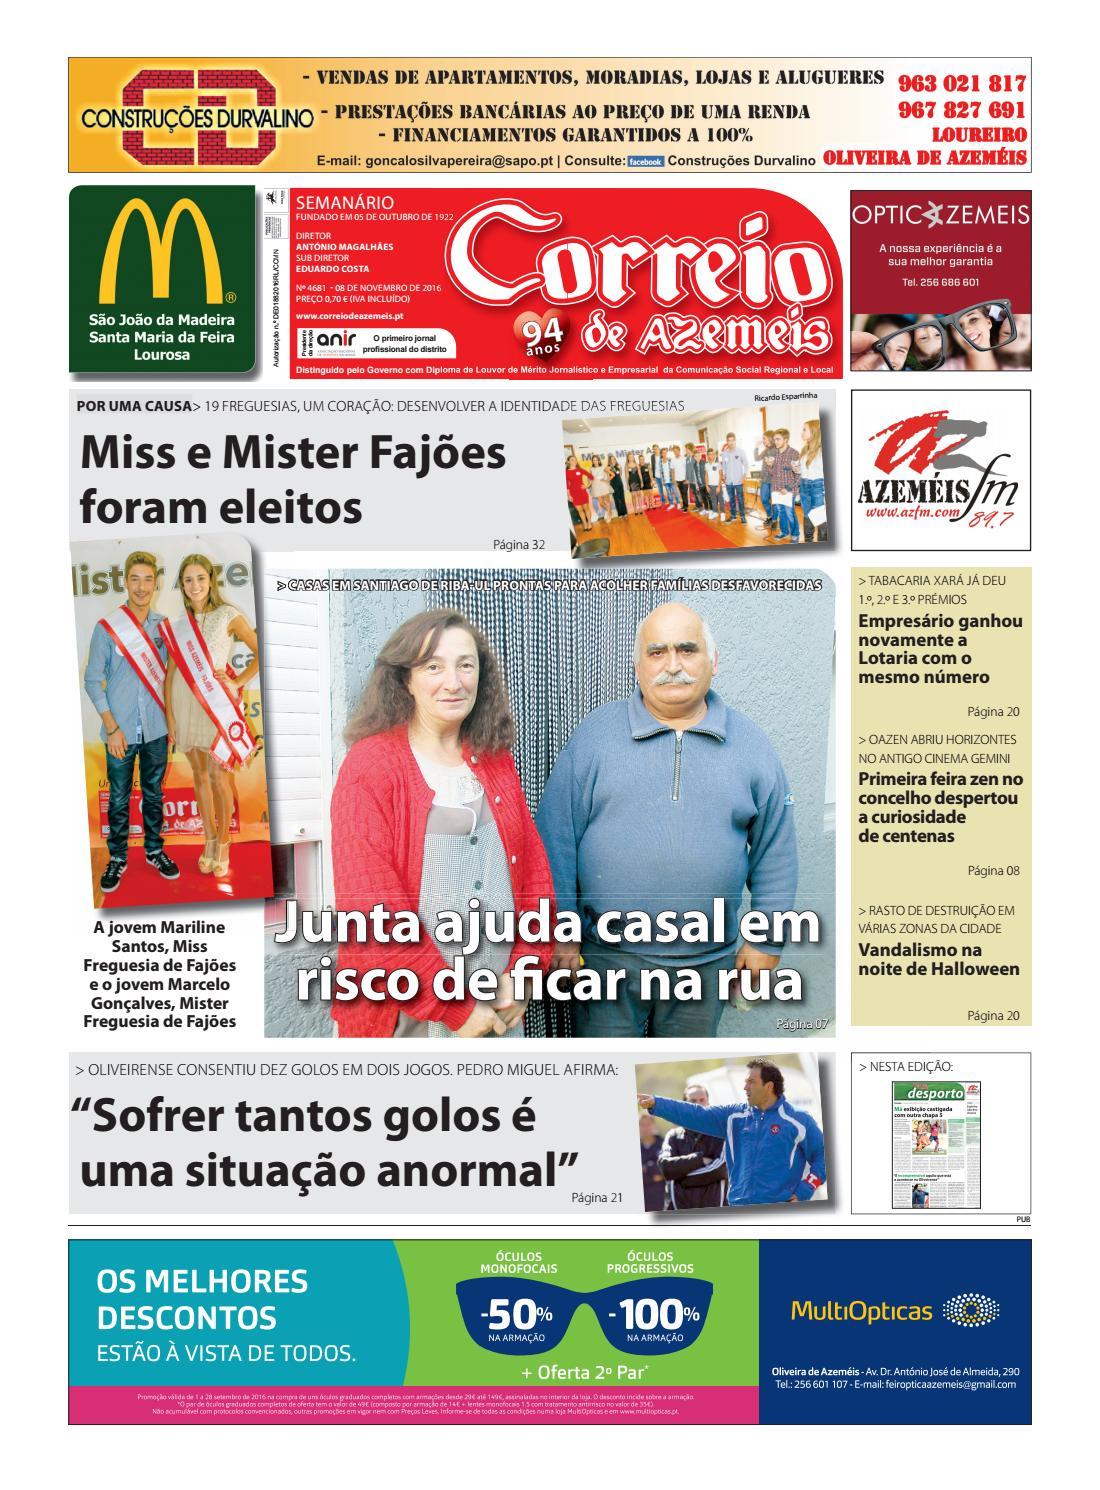 8 11 2016 by Correio de Azeméis - issuu d9f9748c41fb8